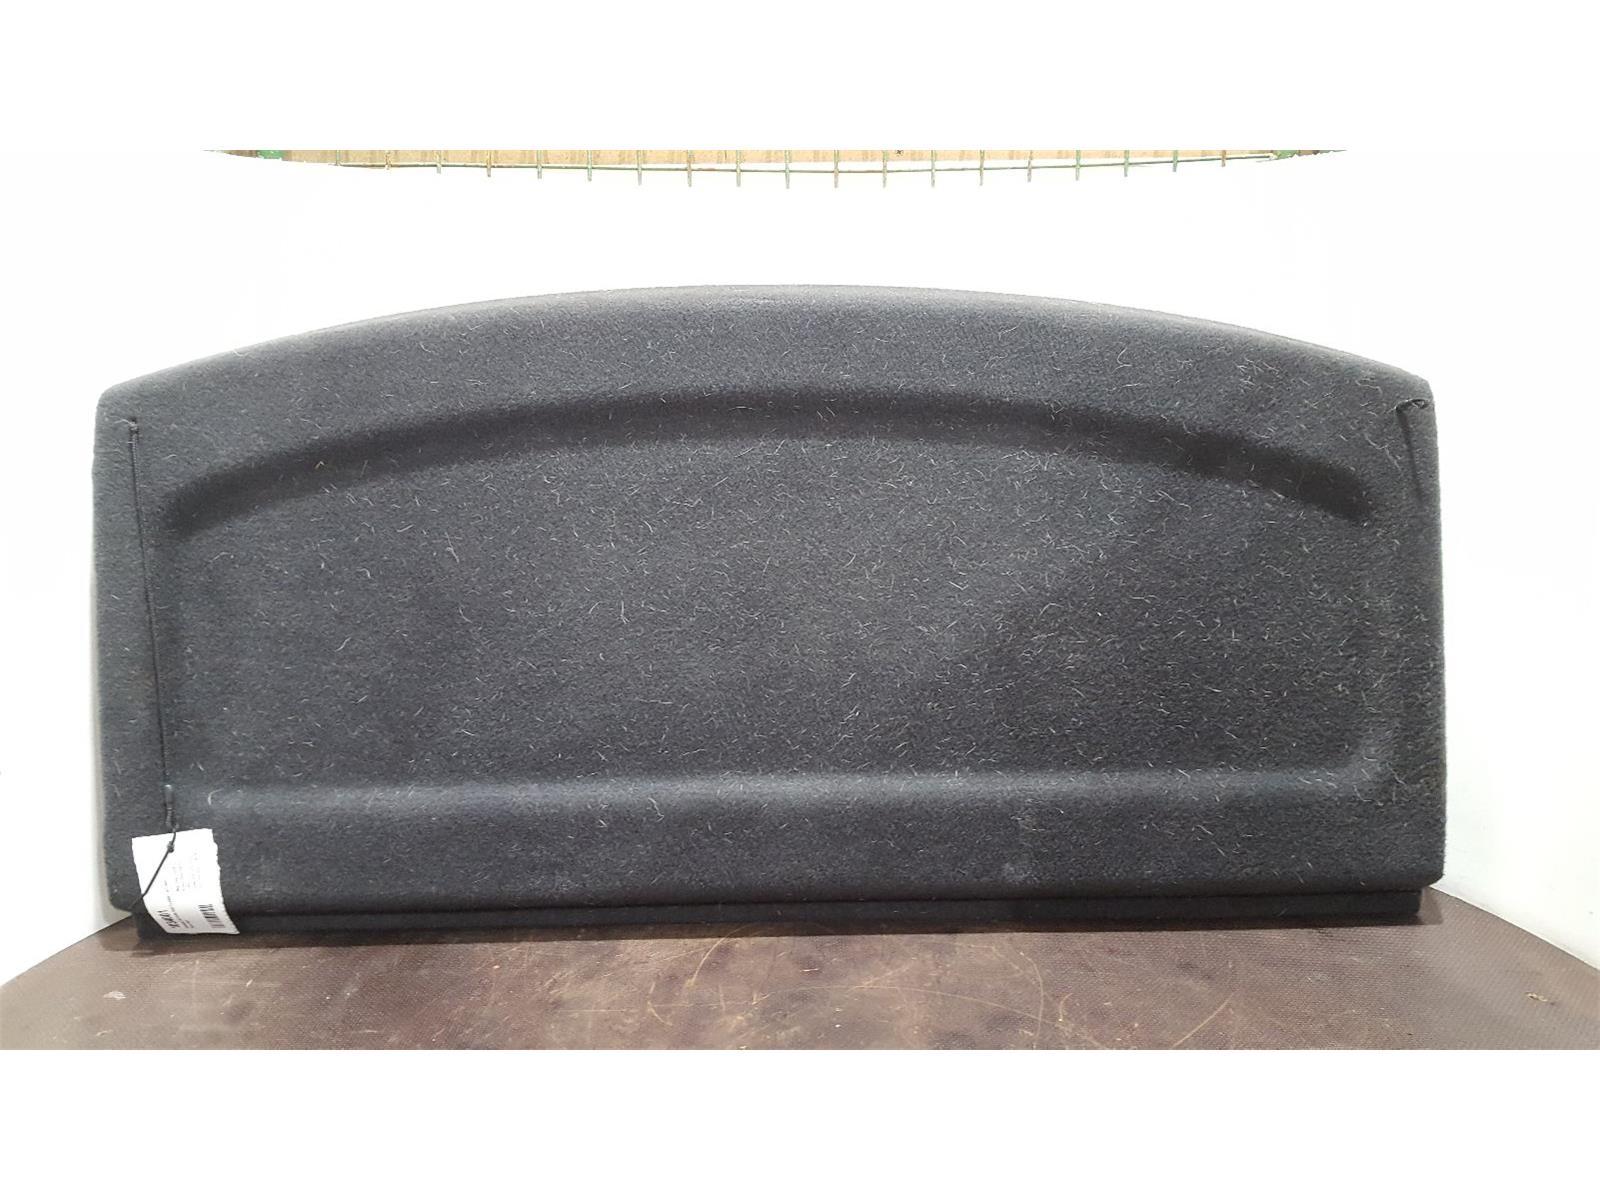 Volkswagen Golf MK5 2003 To 2009 Load Cover Parcel Shelf & Corgo Netting